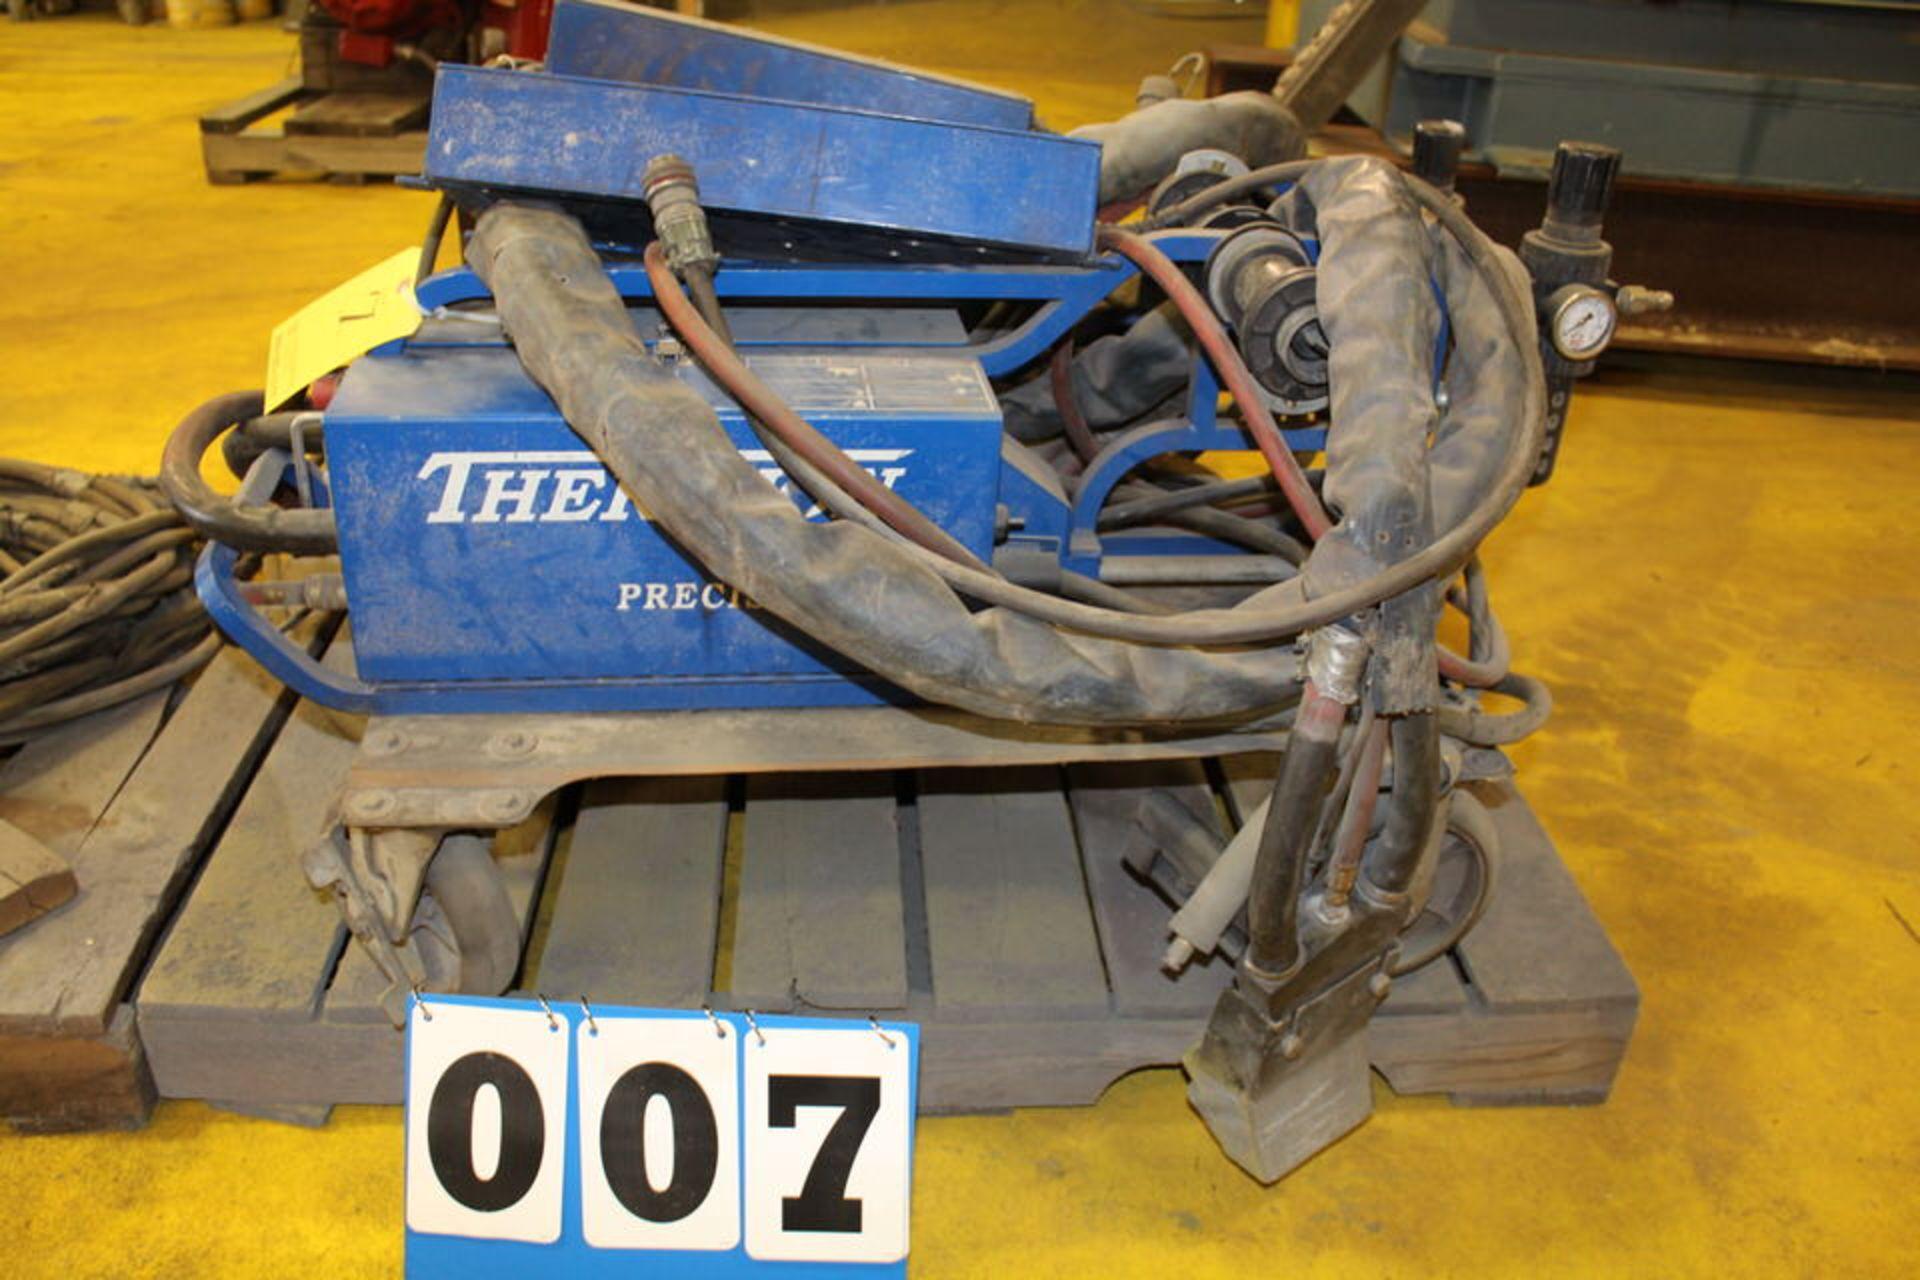 Lot 7 - THERMION PRECISION ARC WELDER 4.8 SPRAY METAL SYSTEM (LOCATION: 4081 EASTSIDE HWY, STEVENSVILLE, MT,